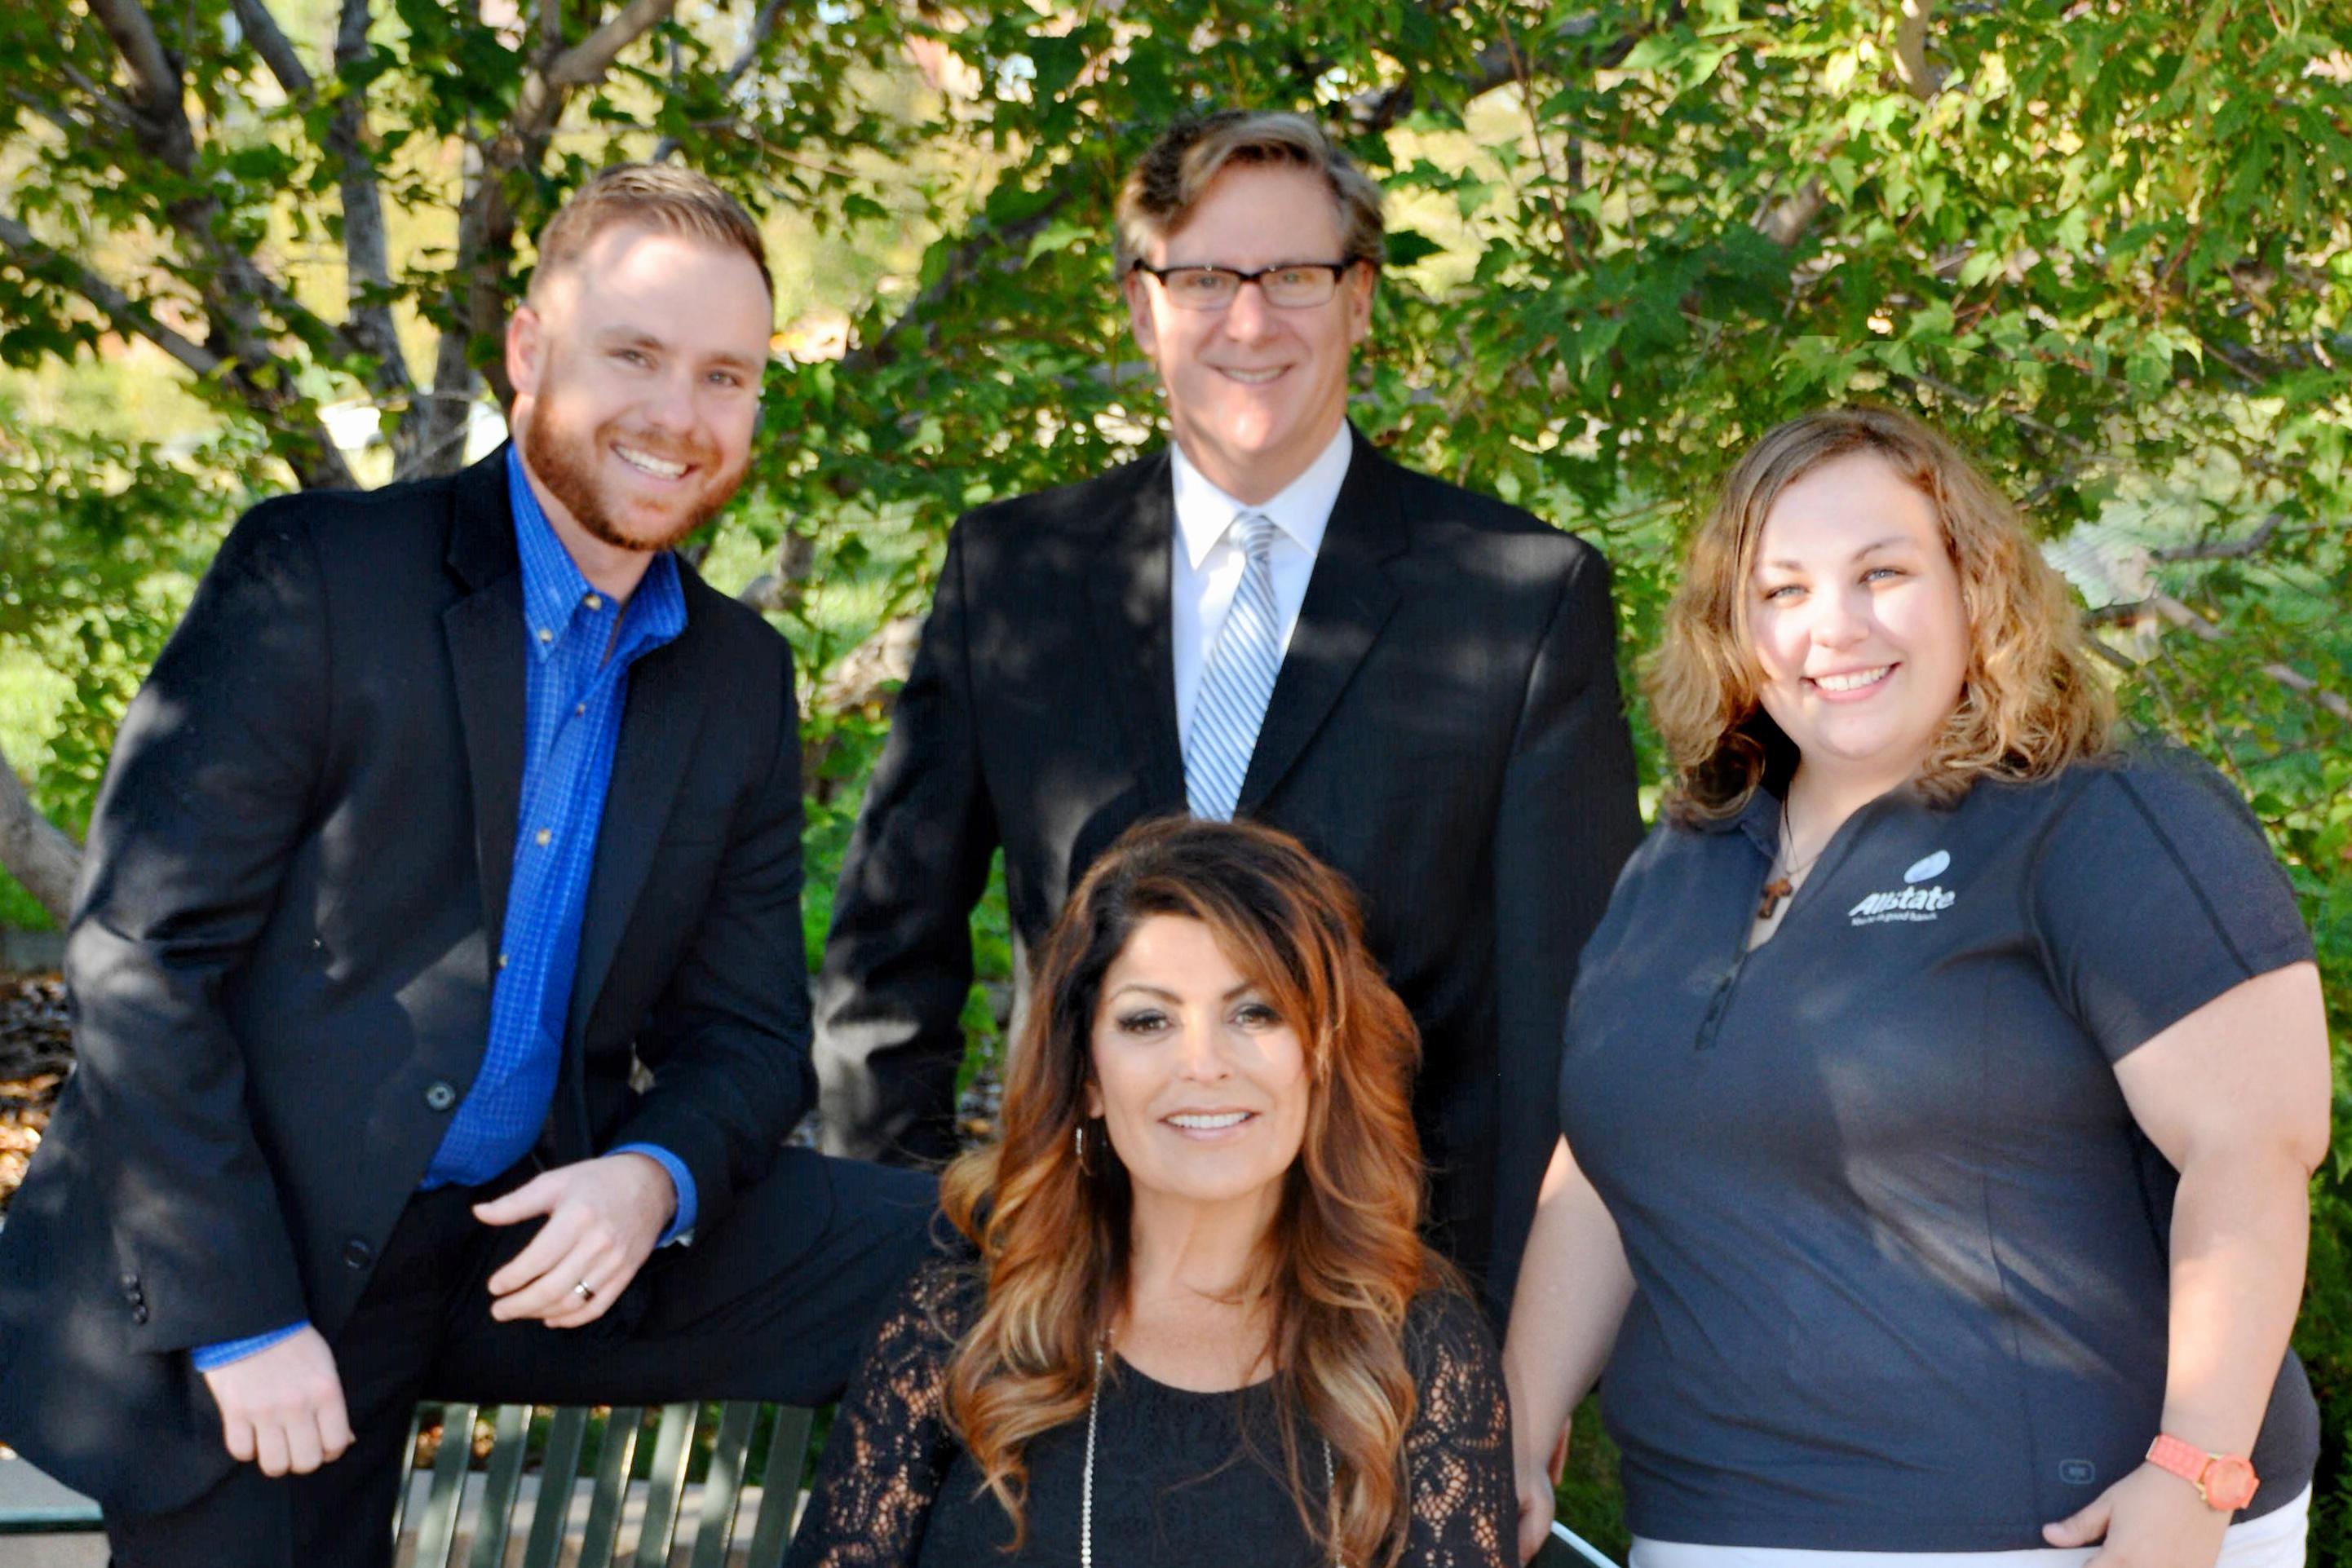 Michelle C. Colaizzi: Allstate Insurance image 7